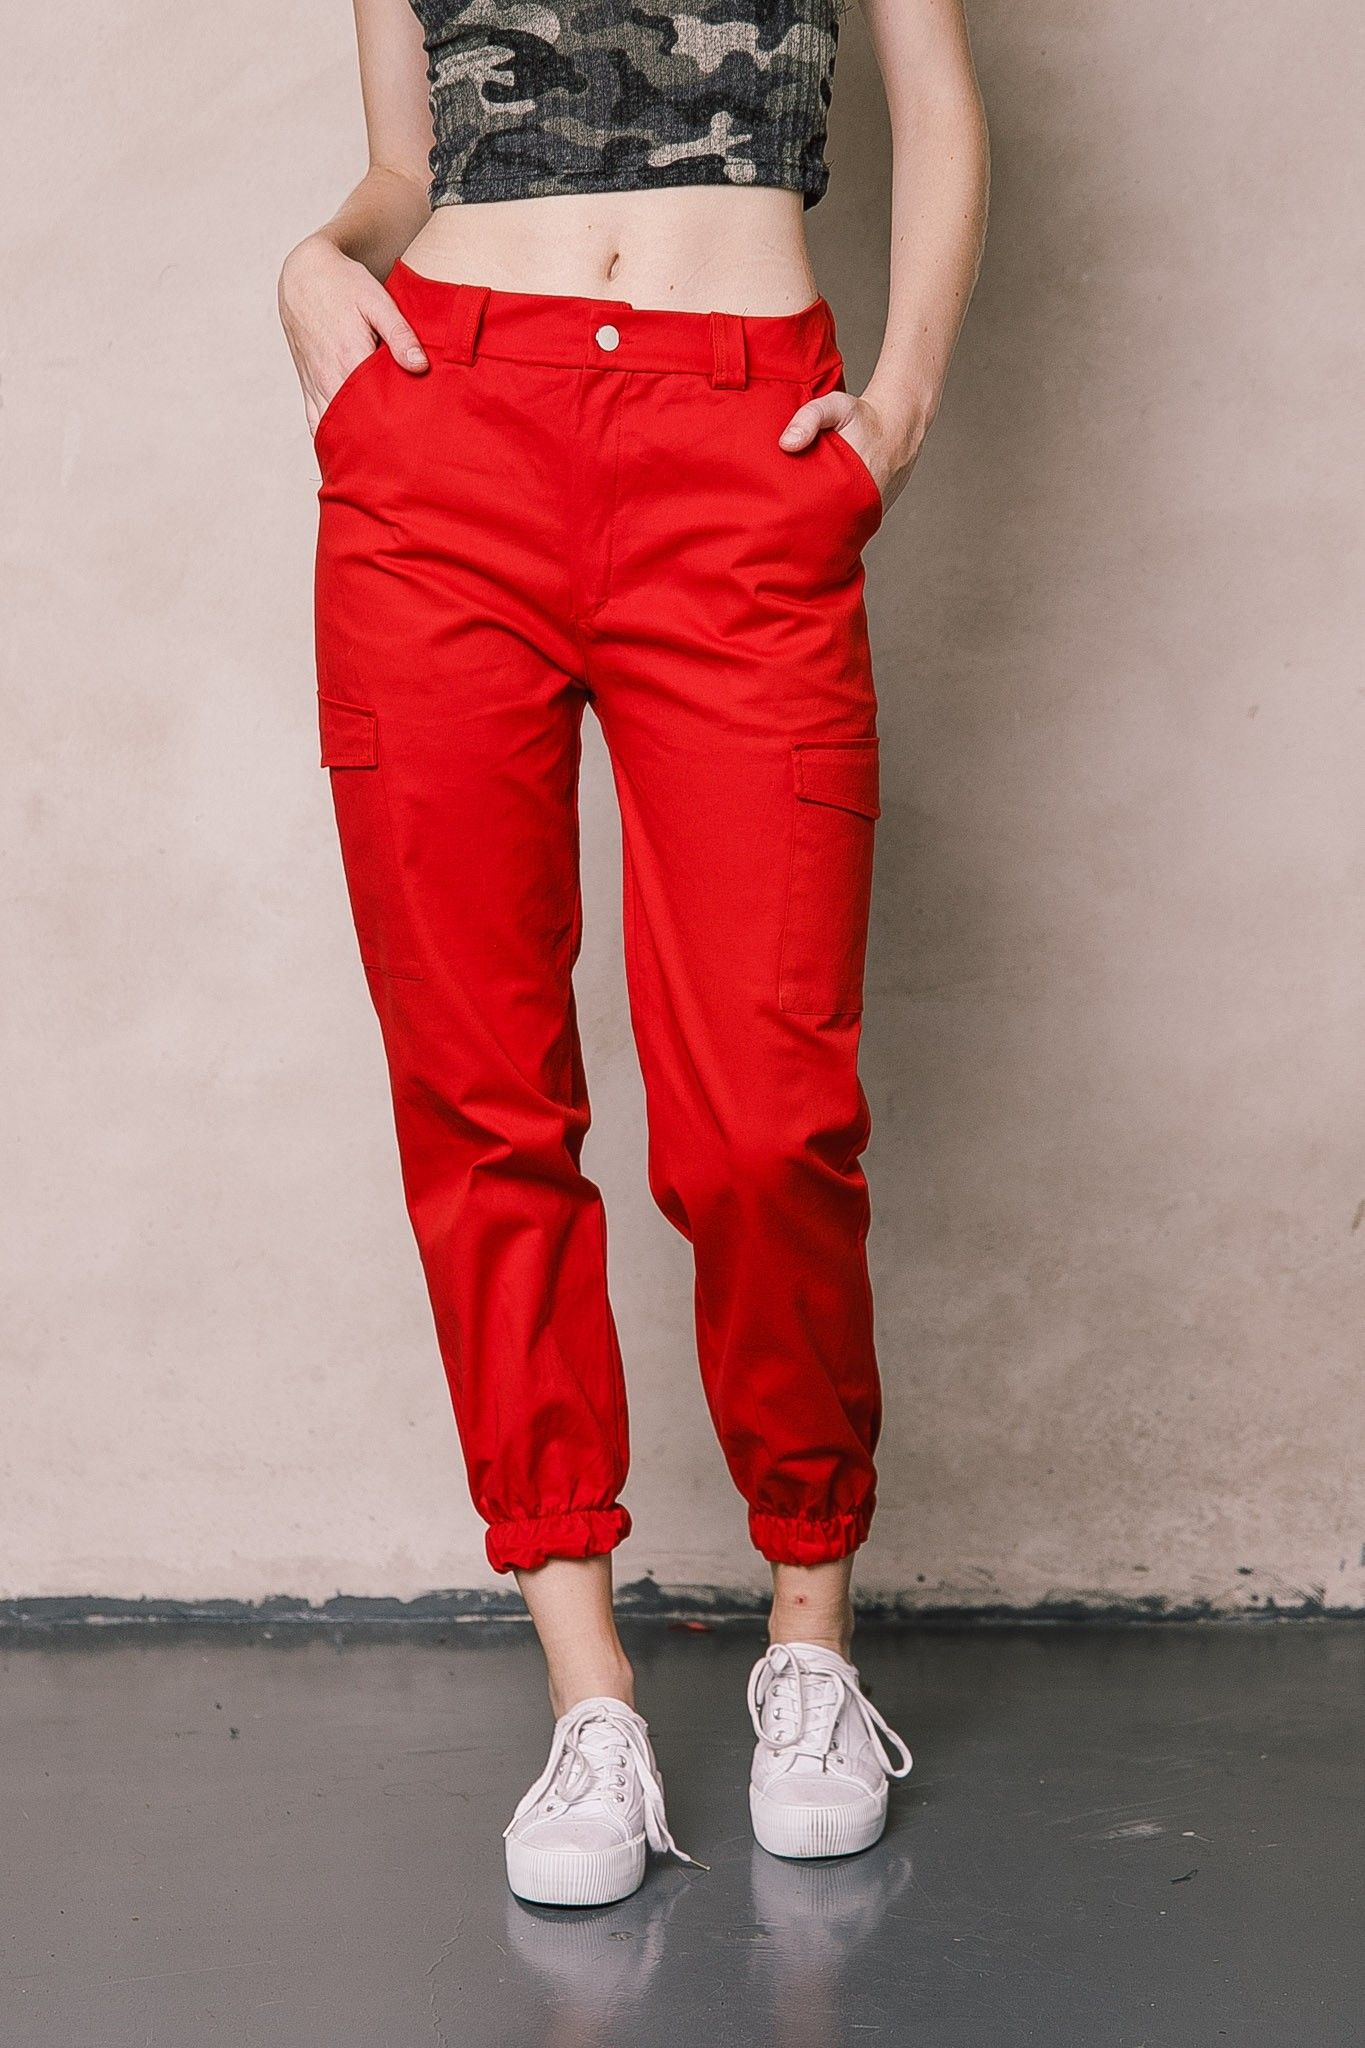 19inp030 Pantalon Cargo Nina Pantalones Con Bolsillos Pantalones Pantalones Mujer